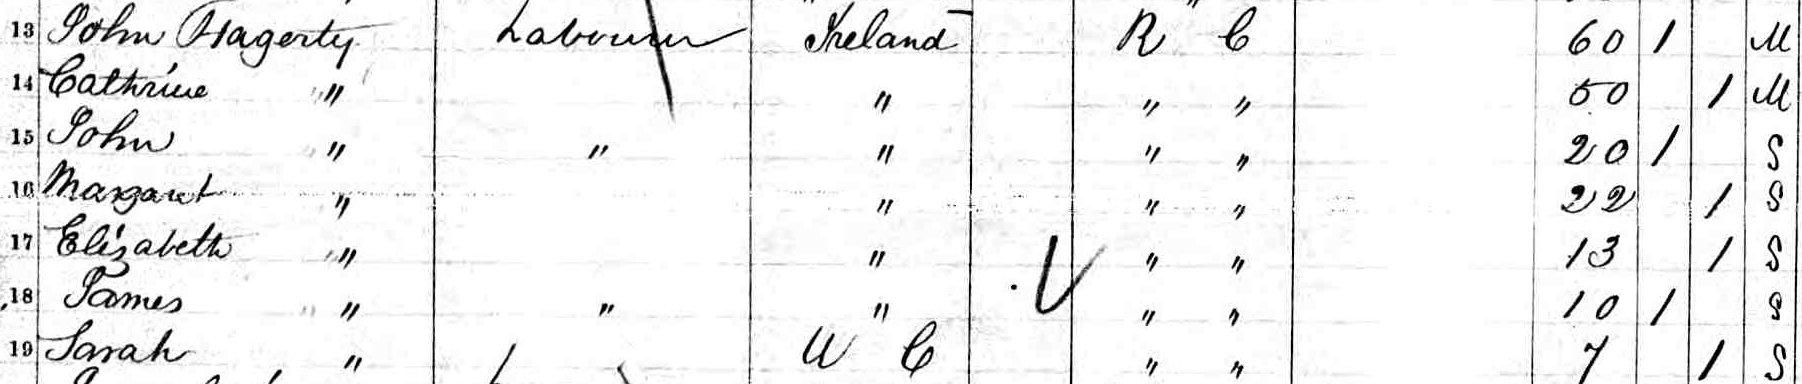 John Hagerty in Kinsgton, Ontario, Canada in 1861